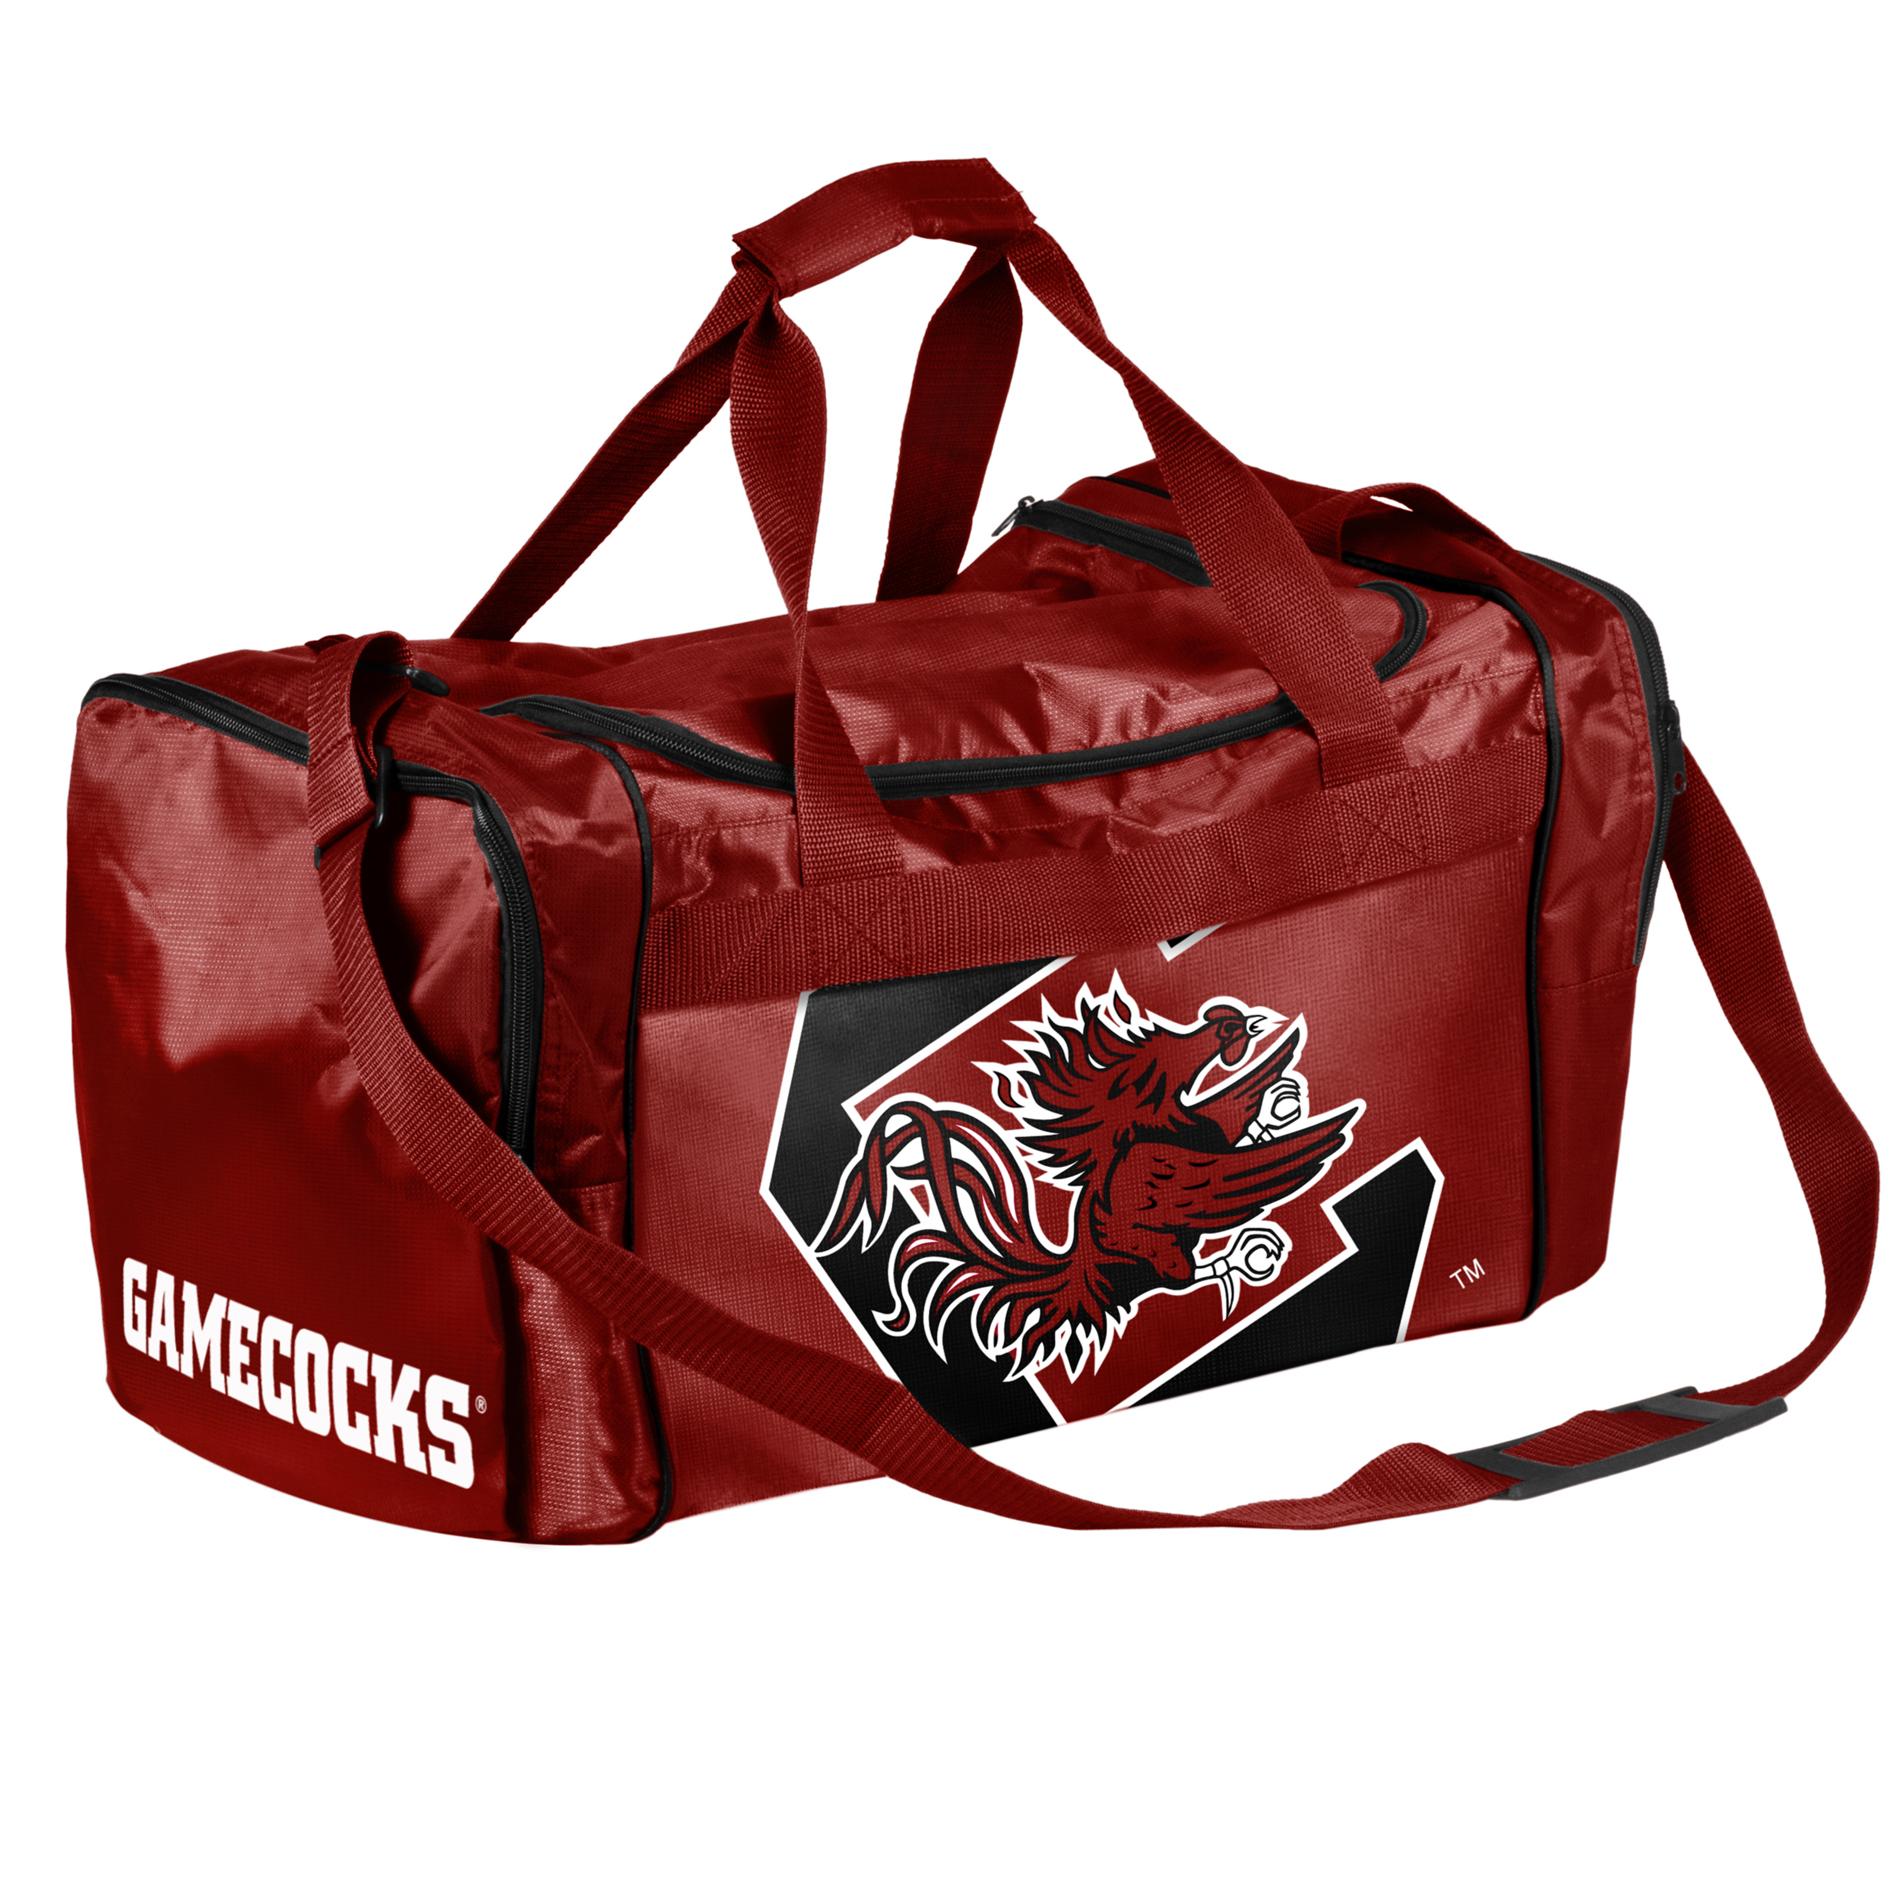 Forever Collectibles NCAA Duffle Bag University of South Carolina Gamecocks (#BGNC13DUFSOC)